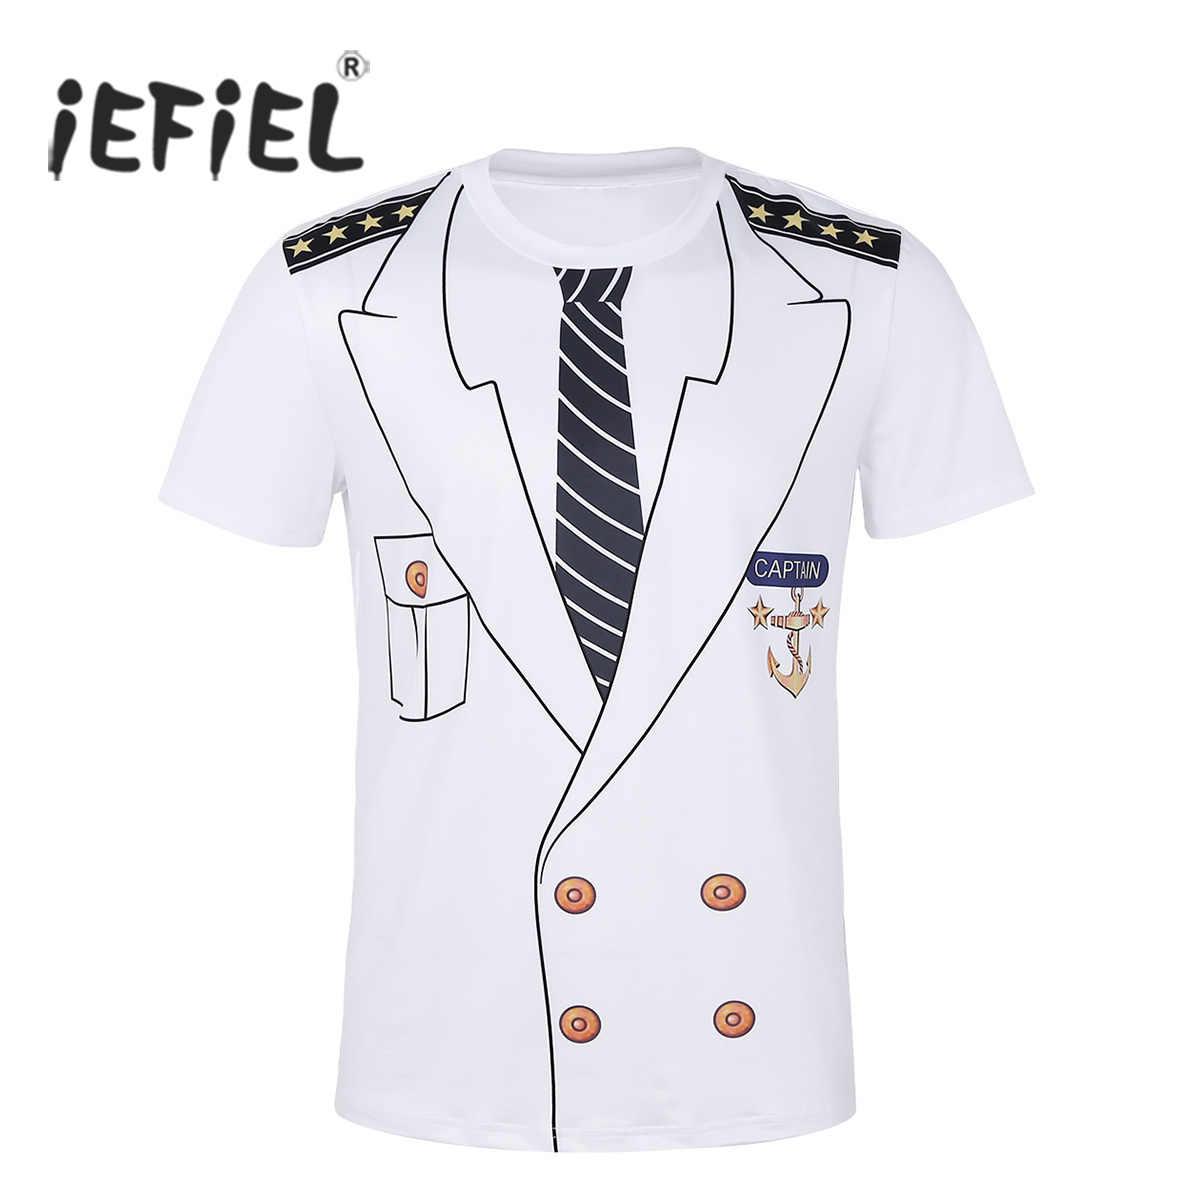 3a0350fe Mens Captain Costume T-Shirts Cosplay Halloween Tee Adult Man Tops Pirate  Clown Pilot Uniform